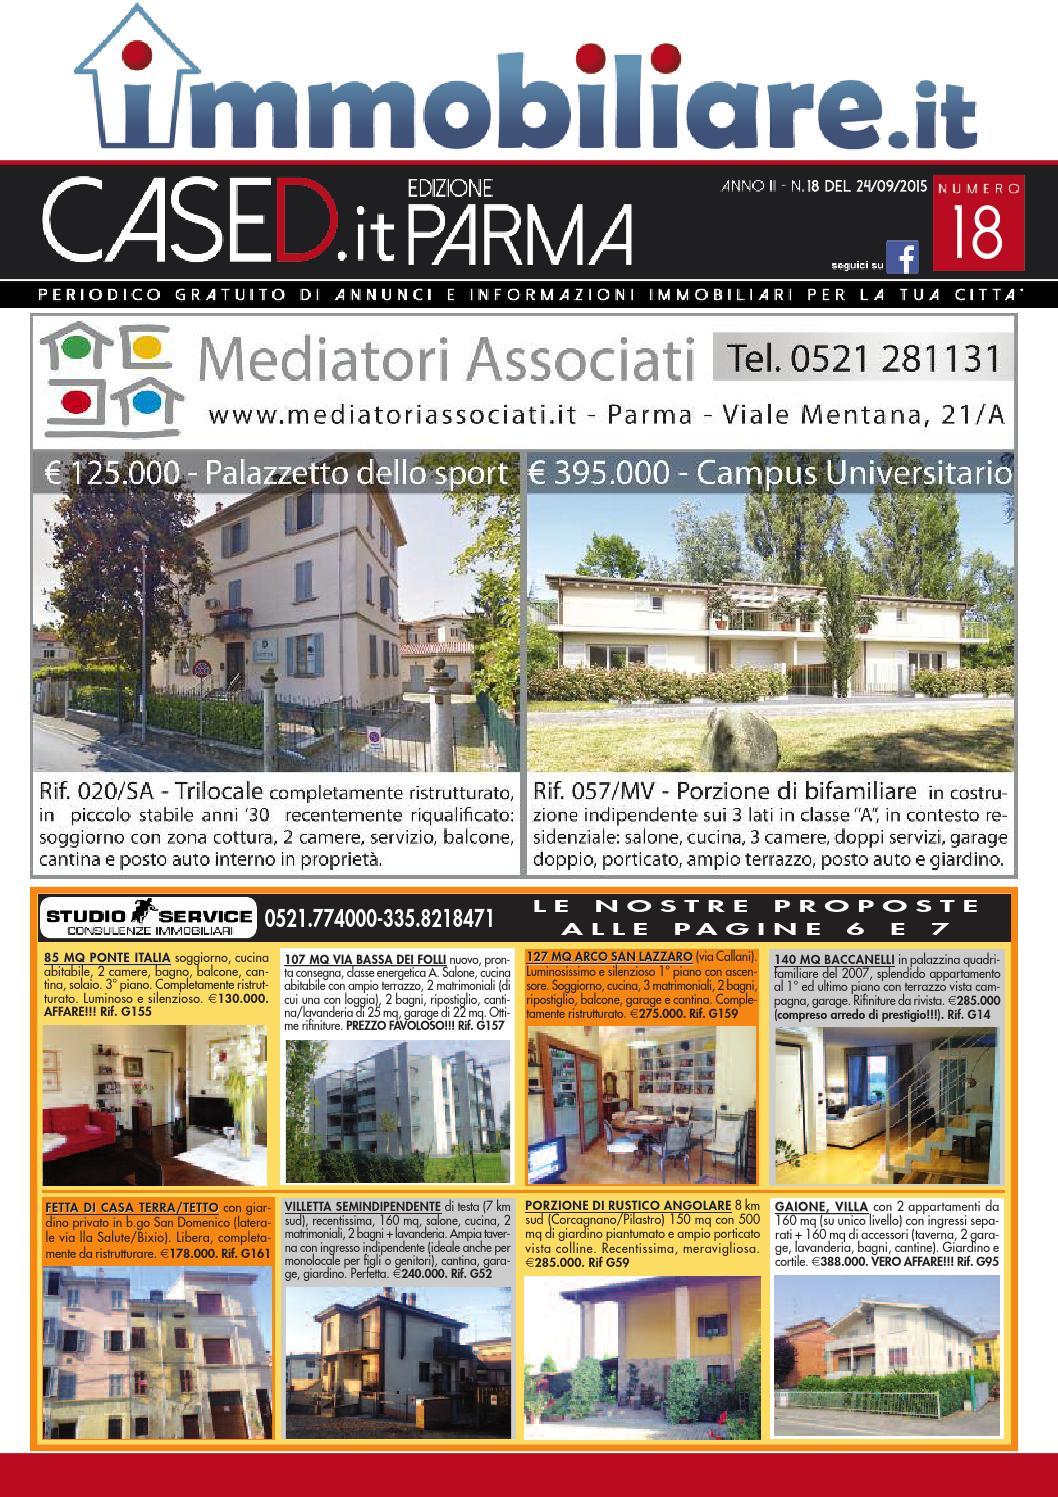 Casedparma N 18 By Press One Srl Issuu